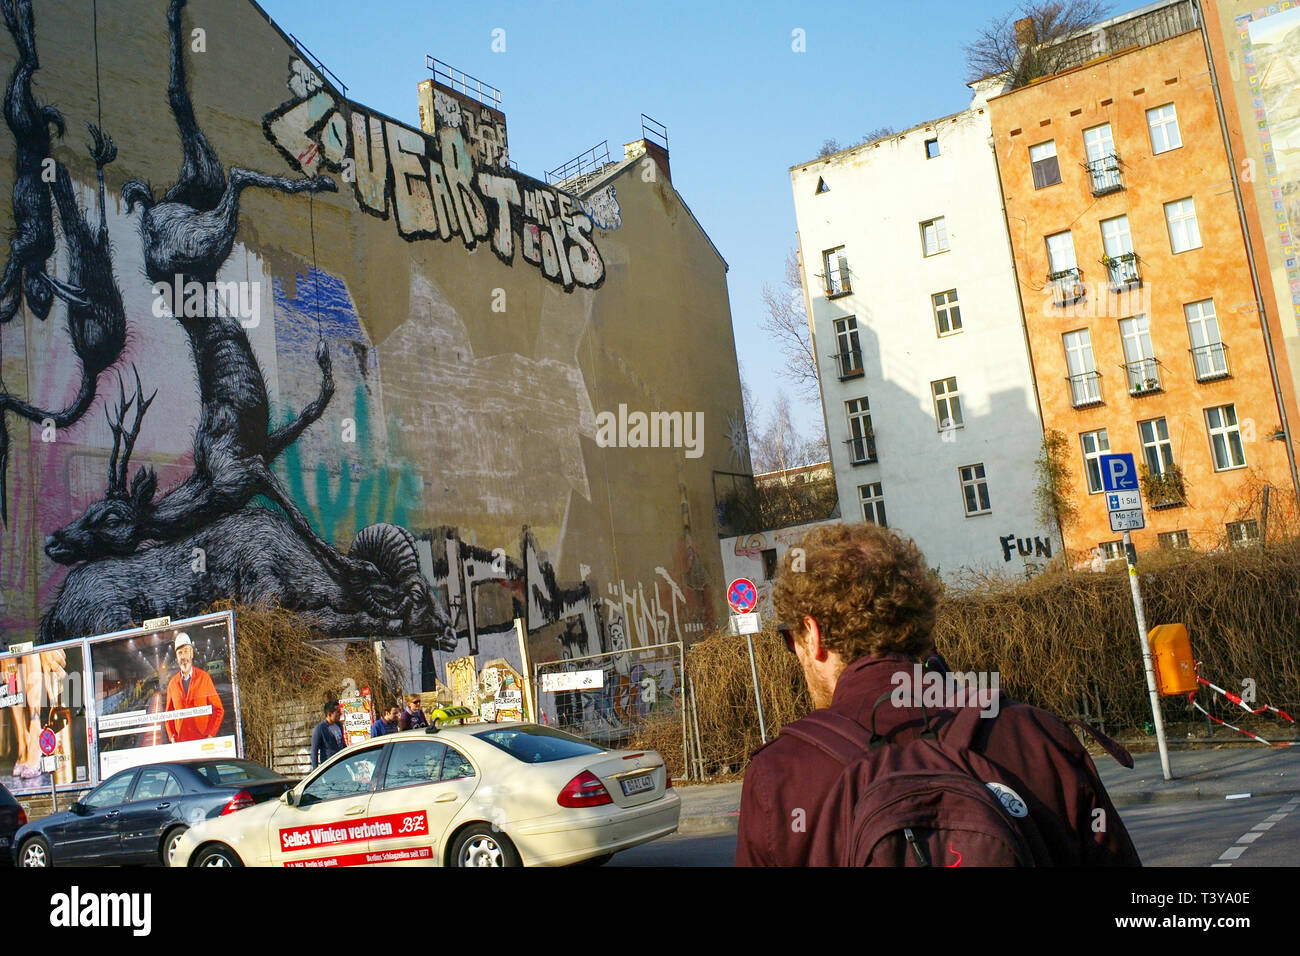 Kreuzberg Street View Stock Photos & Kreuzberg Street View